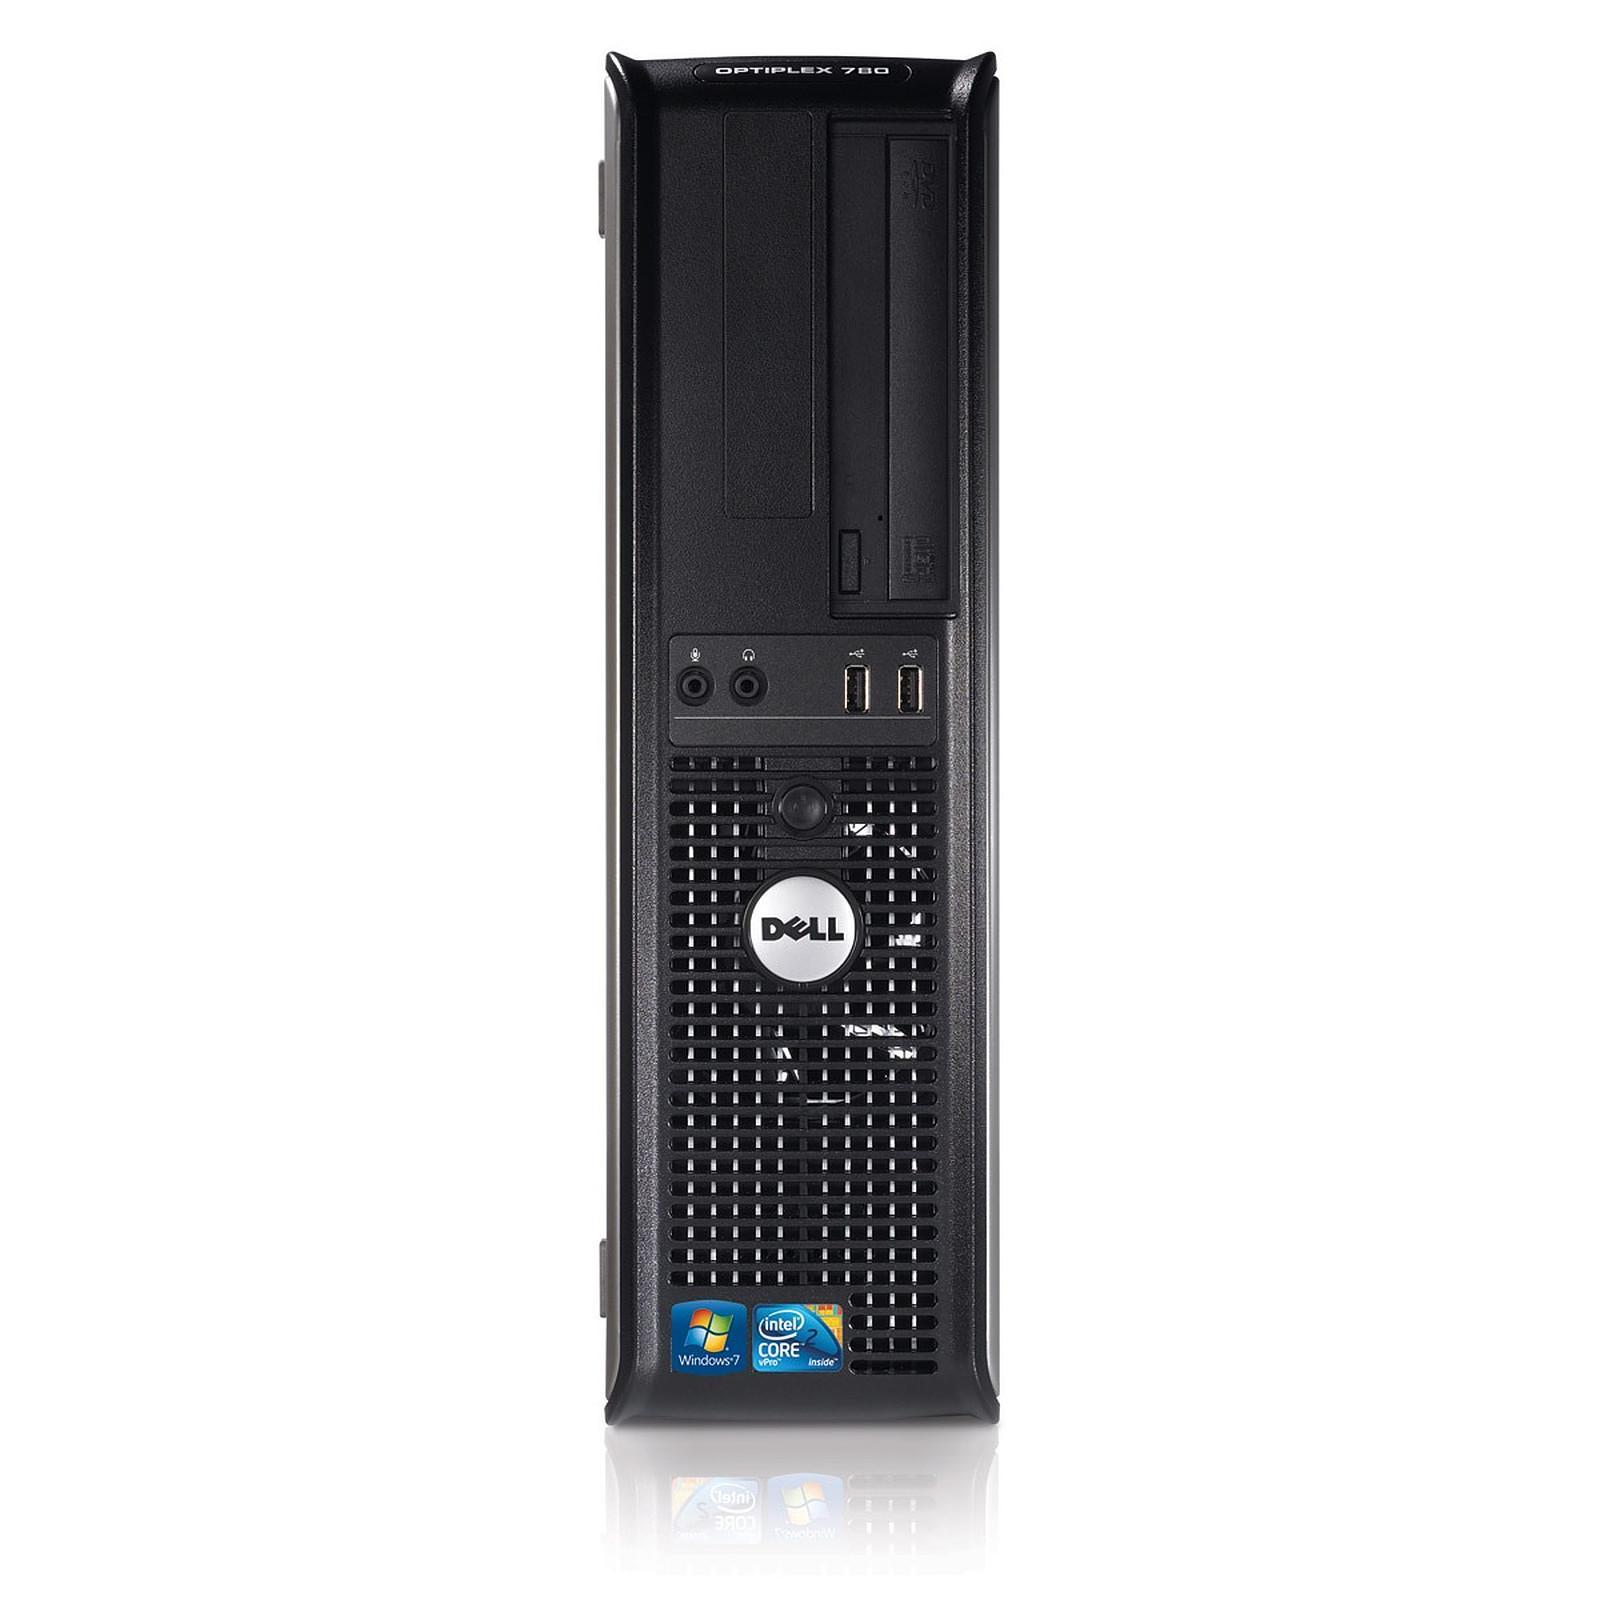 Dell Optiplex 780 DT Core 2 Duo 3 GHz - SSD 480 Go RAM 4 Go